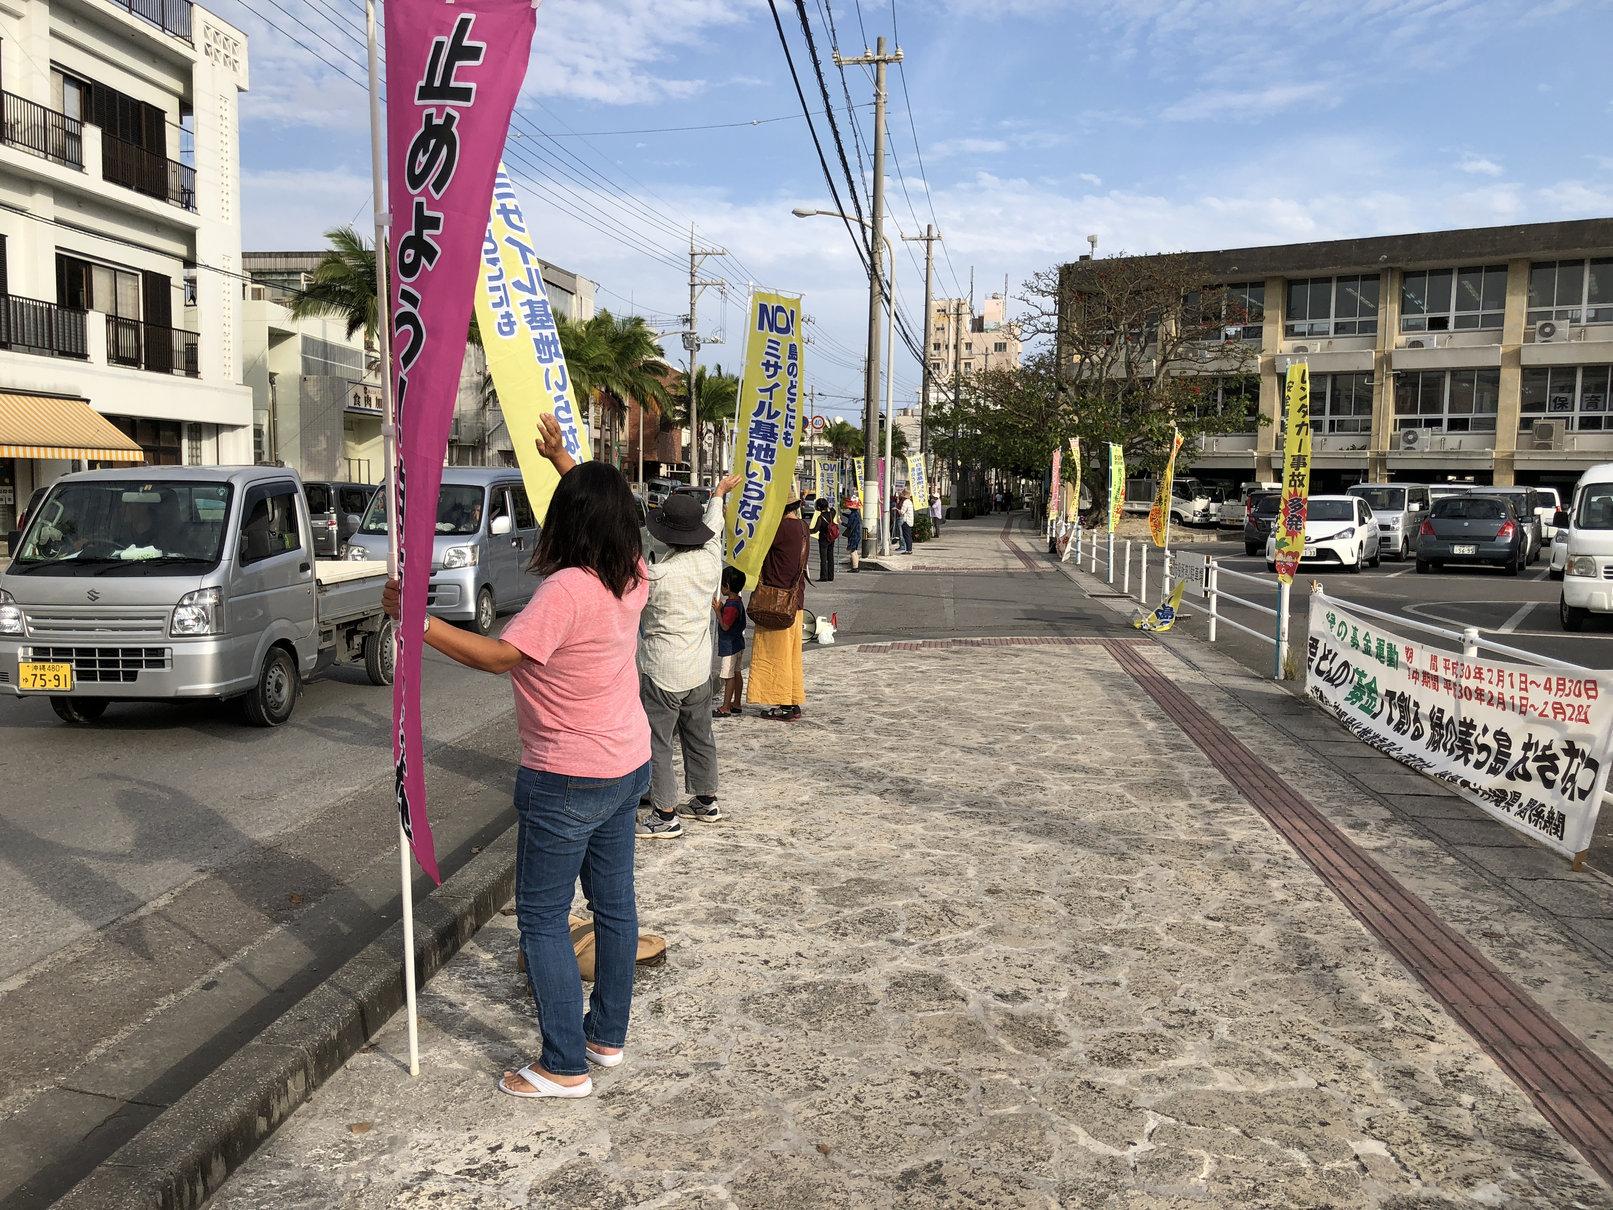 2018 0418 石垣市役所前街頭アピール01